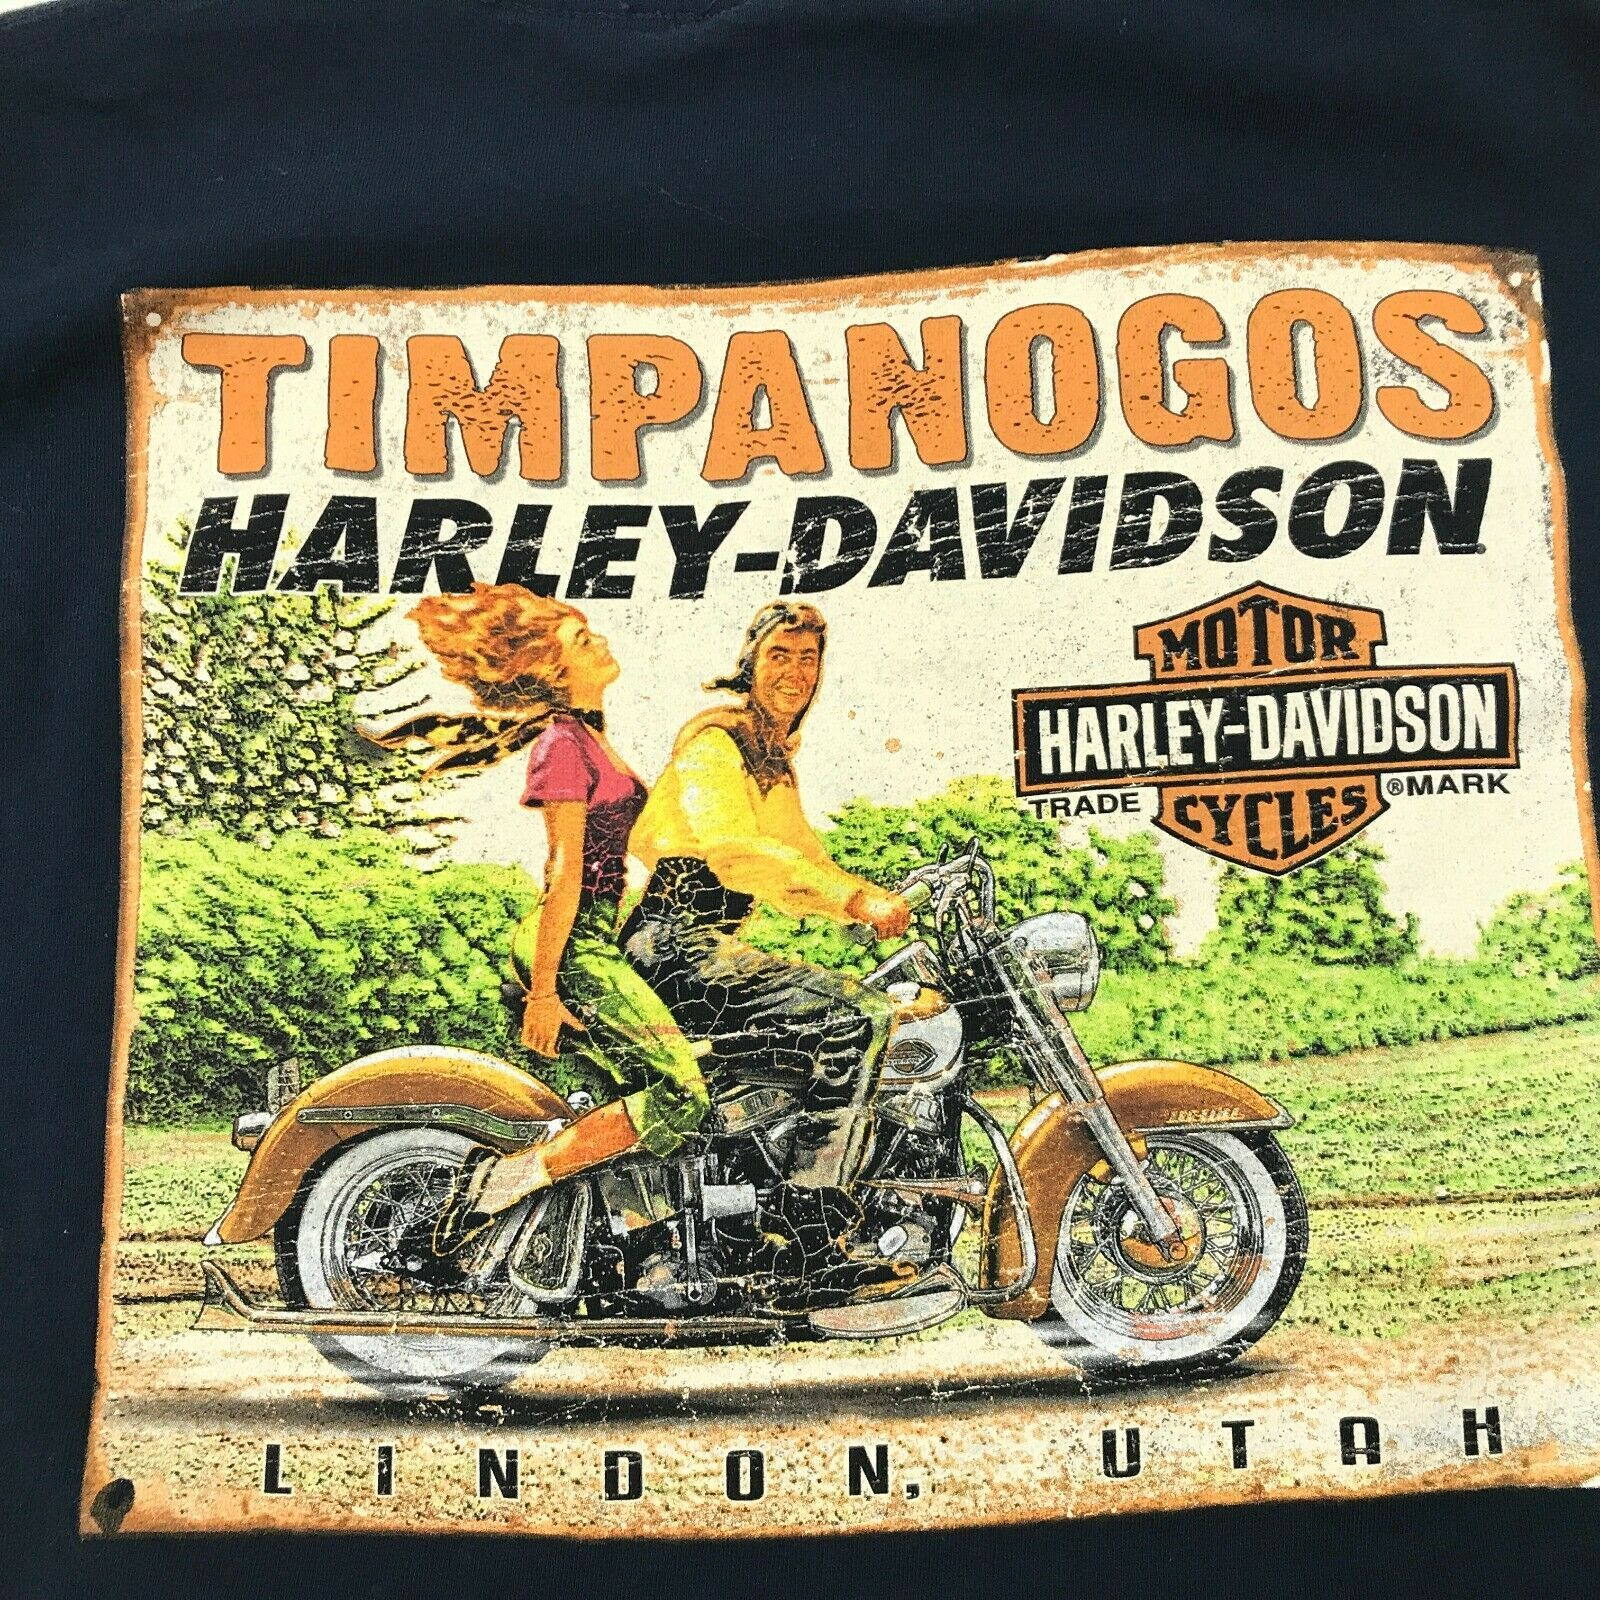 Harley Davidson Imagen Retro Camisa Dos Caras Azul Marino Motero Camiseta TALLA image 3